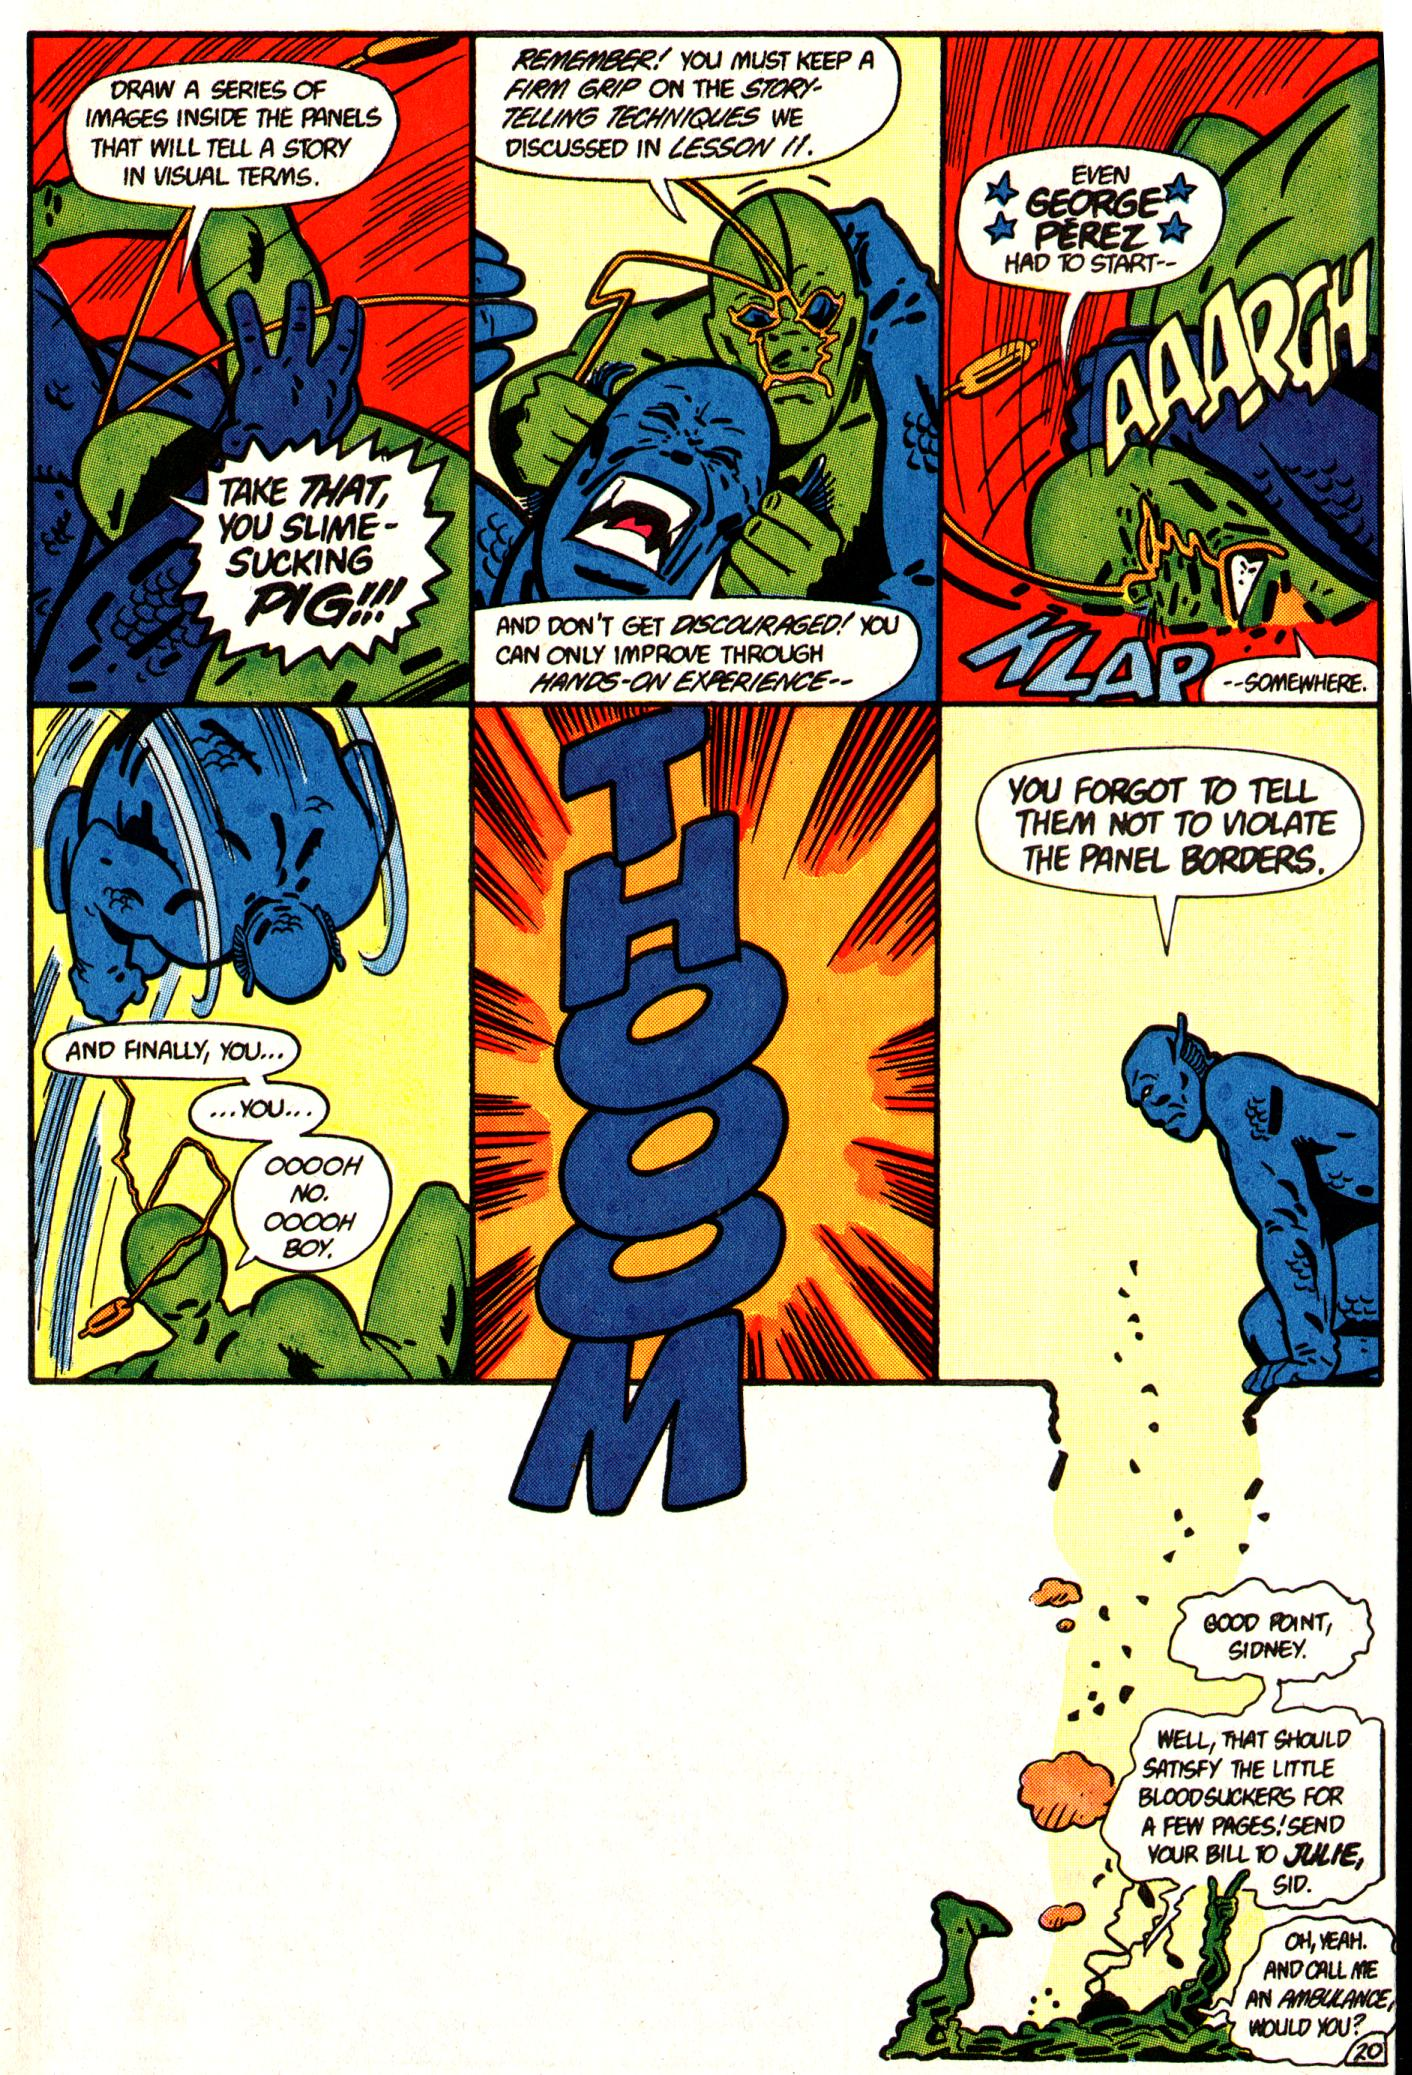 Read online Ambush Bug comic -  Issue #3 - 27